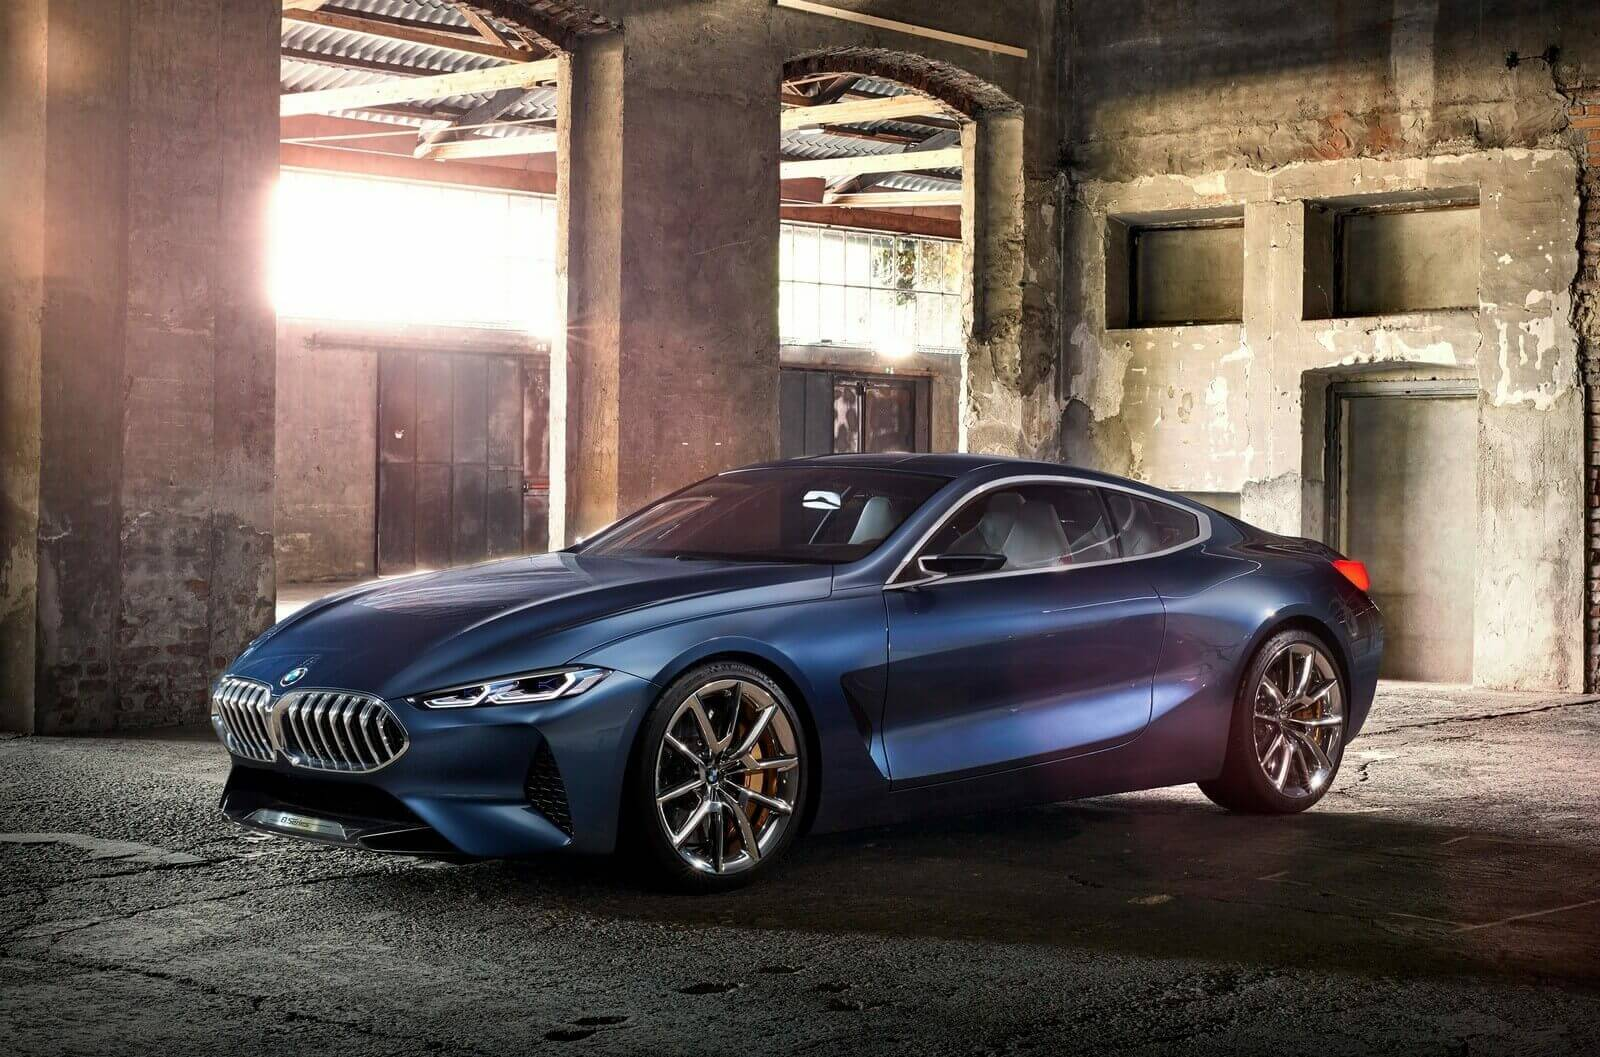 BMW 8 серии, защита, угон, авто, кража